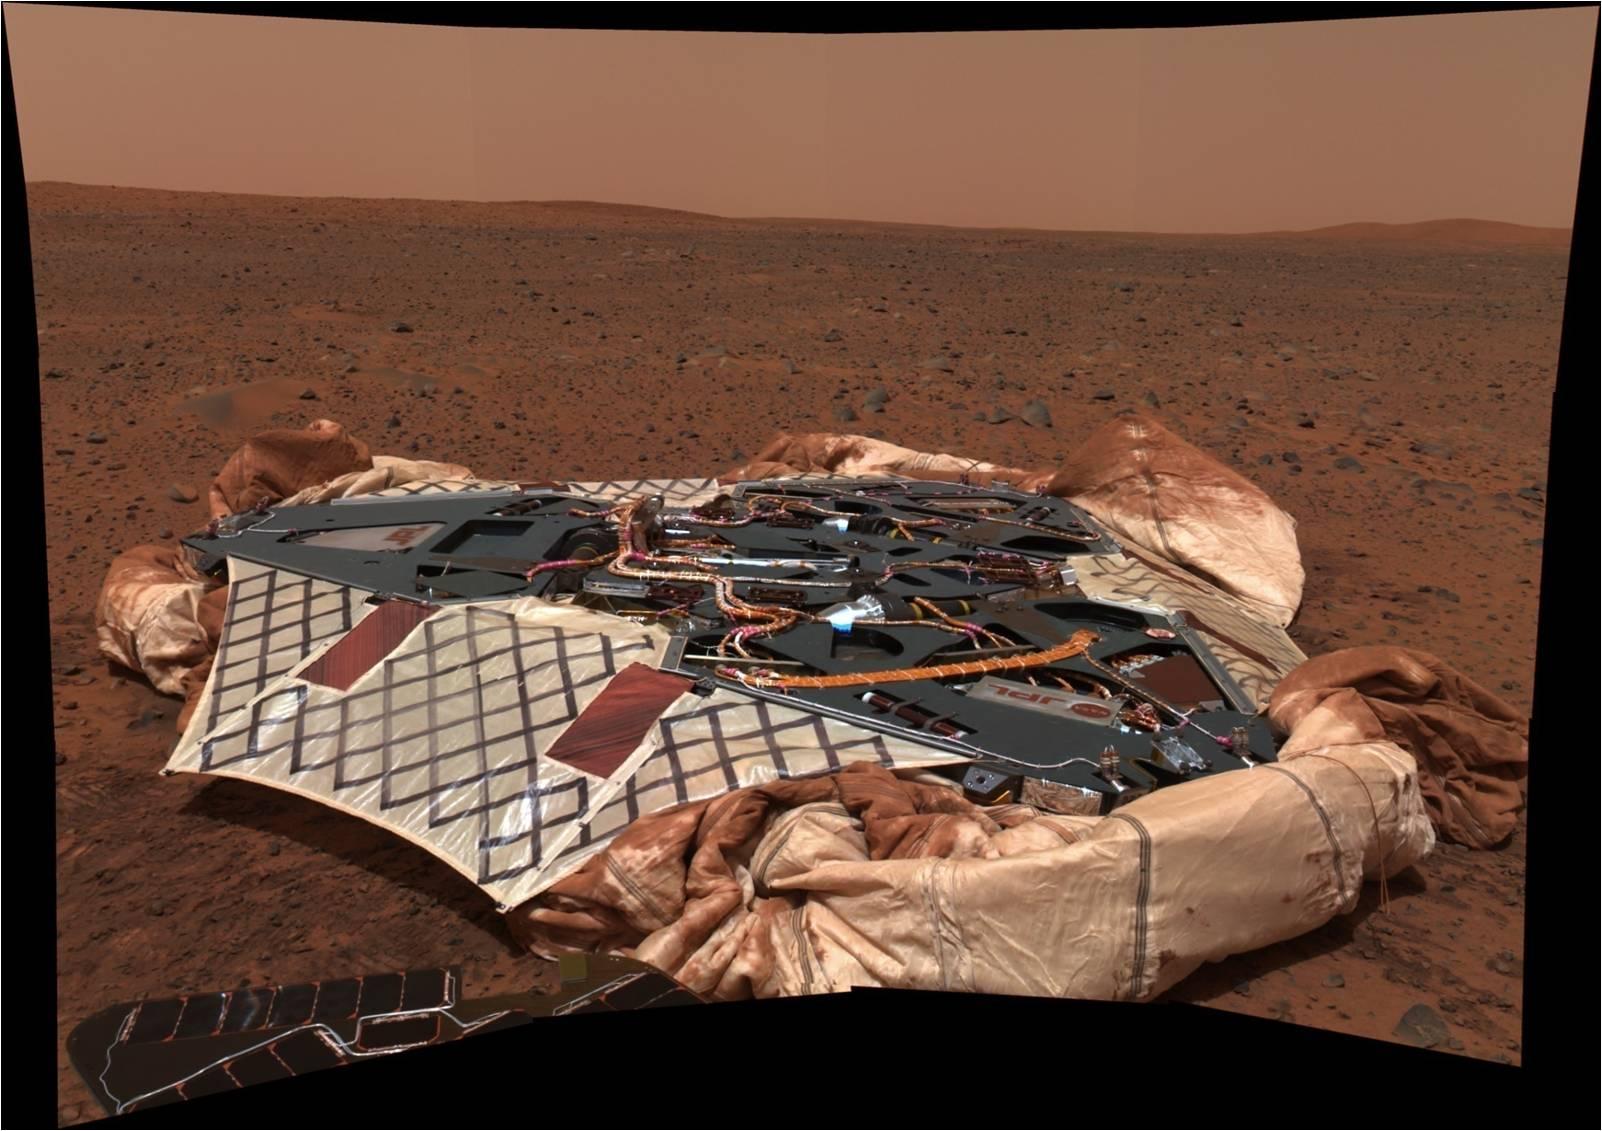 mars rover landing airbags - photo #20